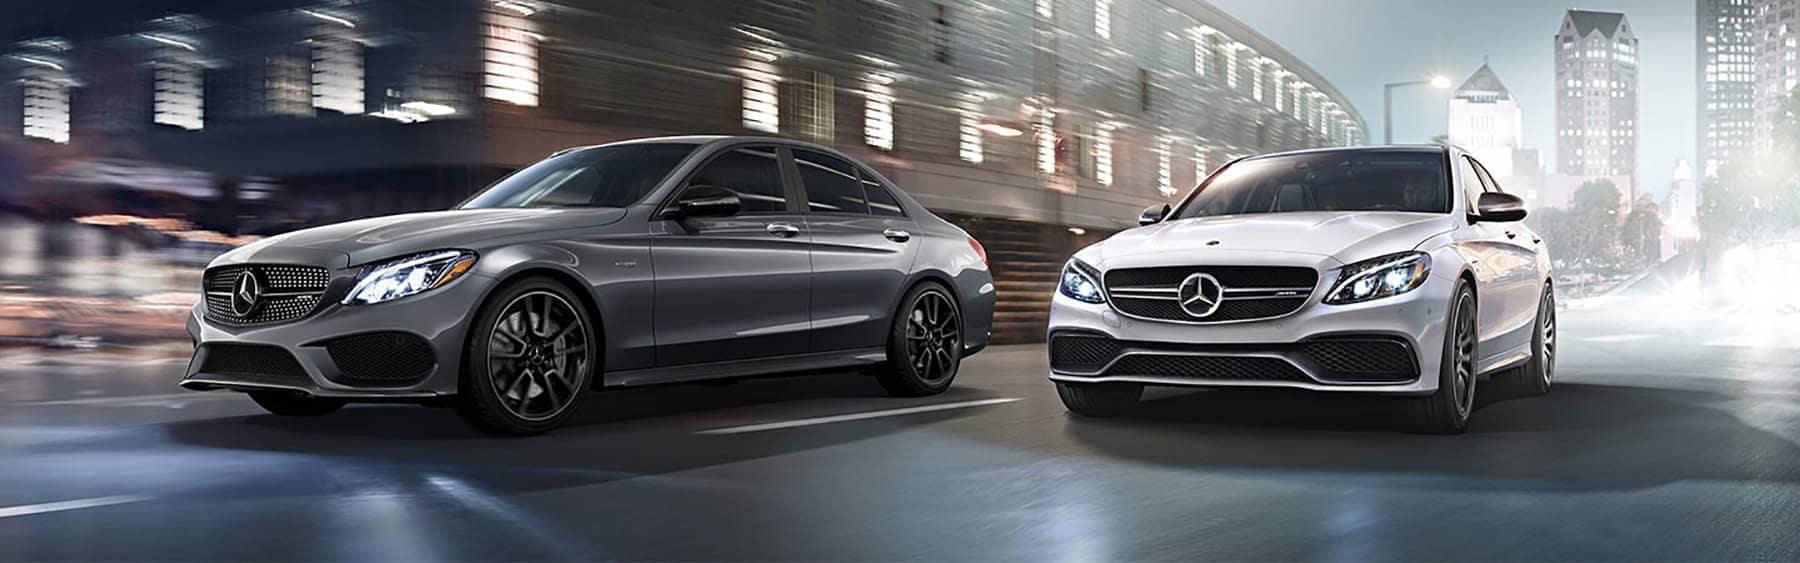 Mercedes benz amg models list